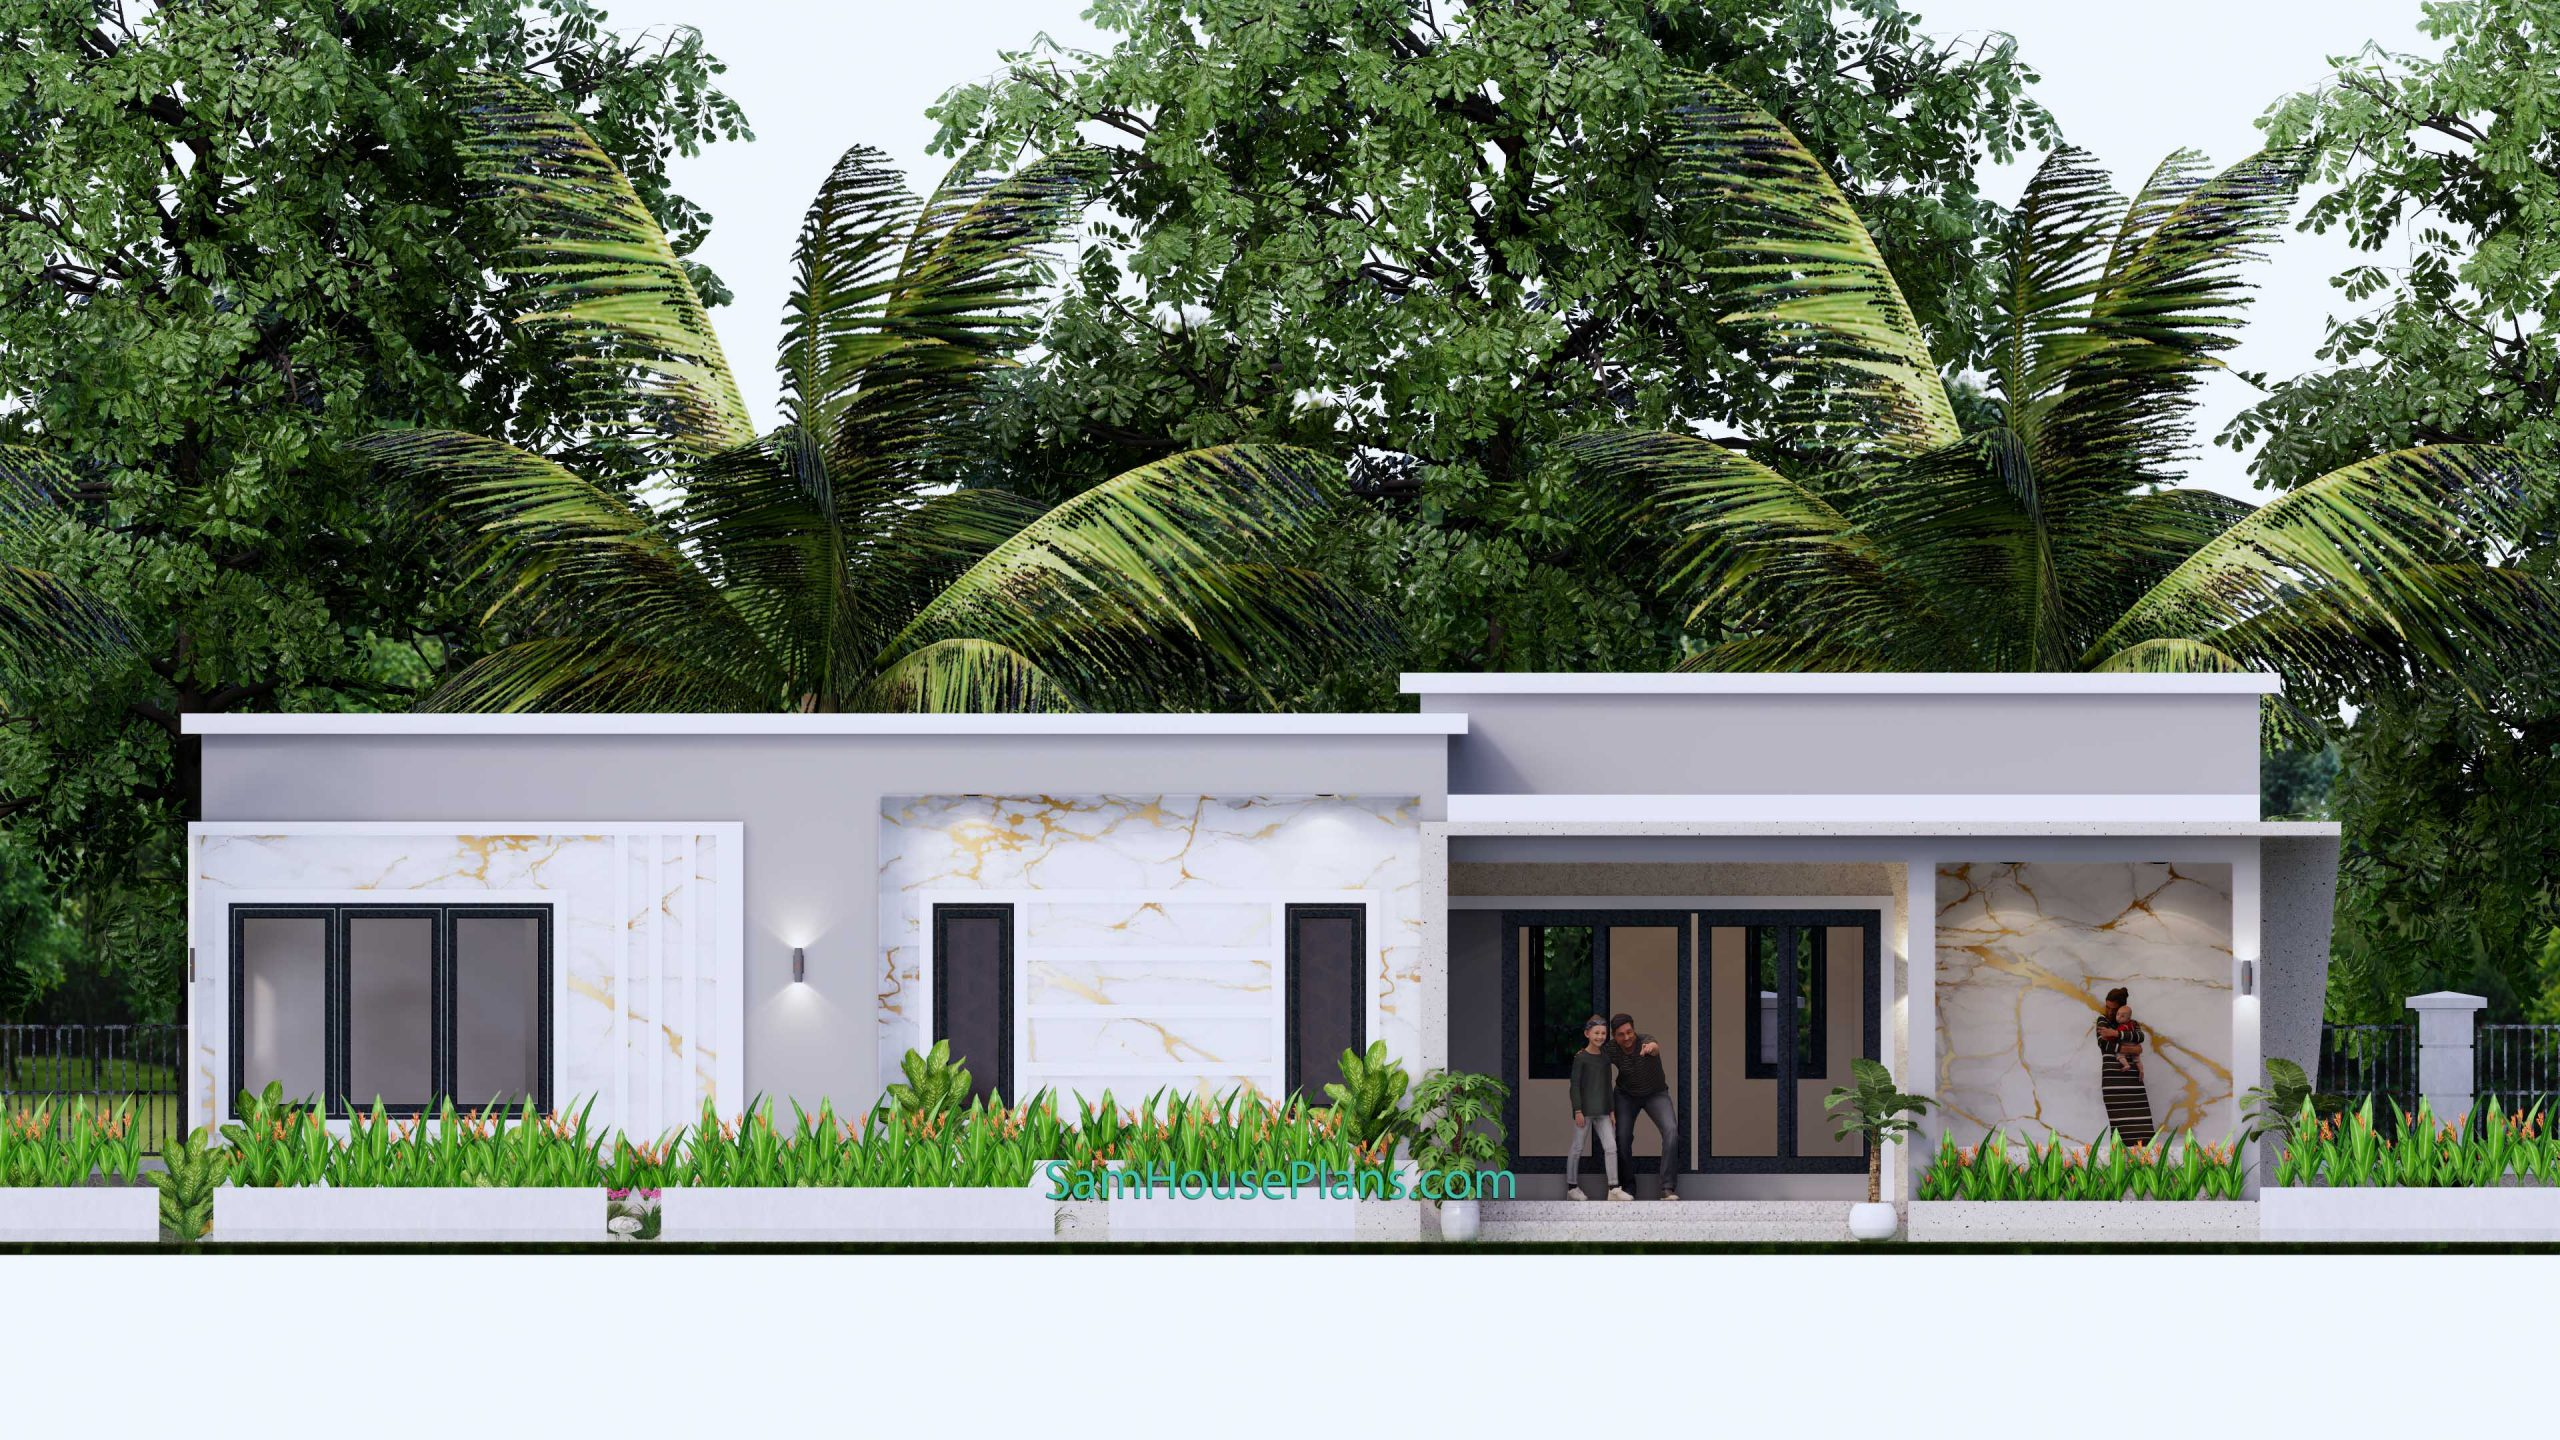 Front elevation Modern House Design 15x9 M 49x30 Feet 3 Beds PDF Plan